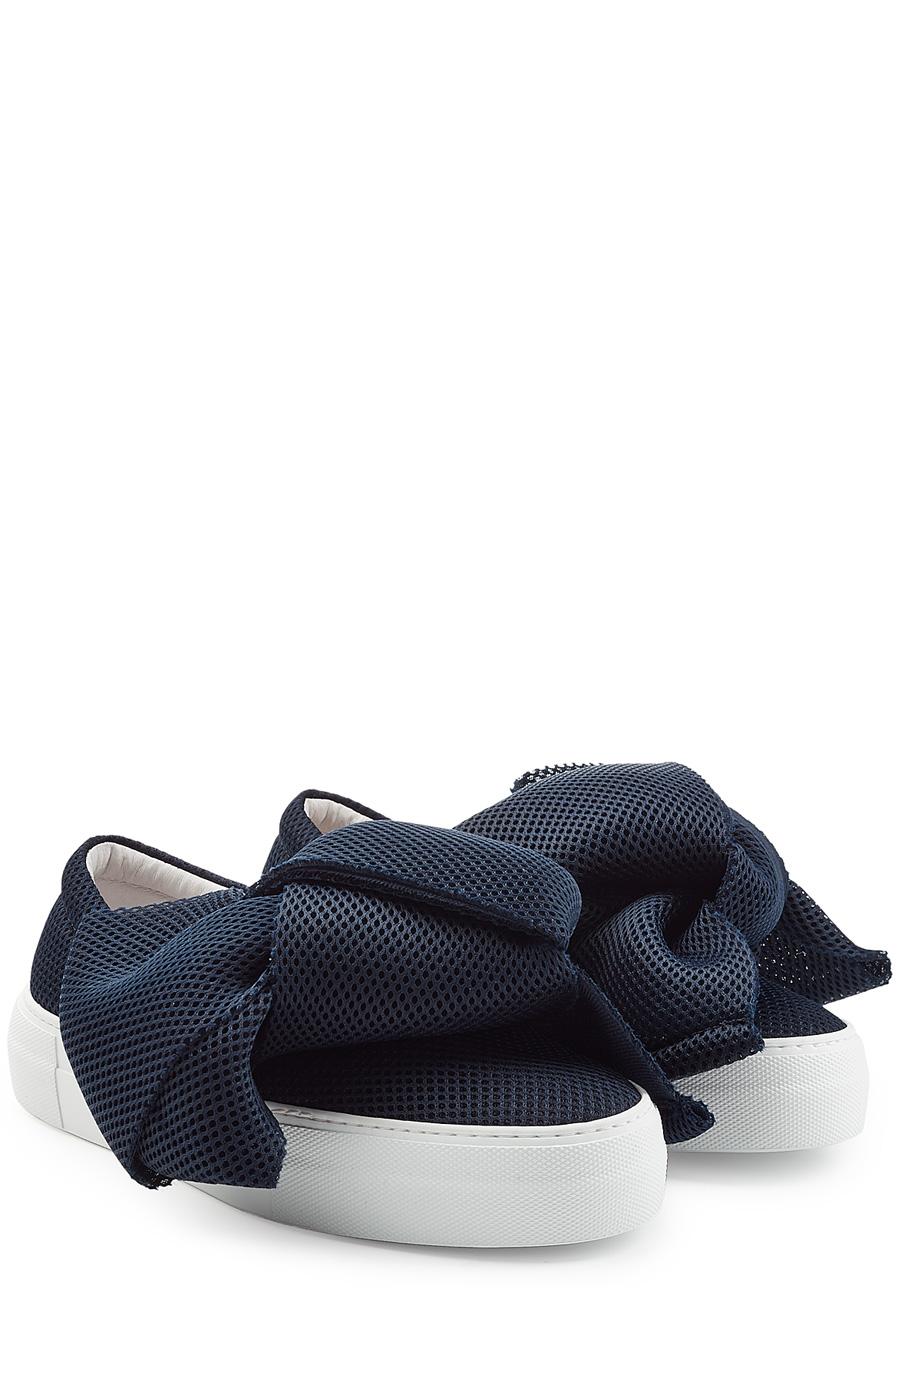 Joshua Sanders Oversized Bow Sneaker